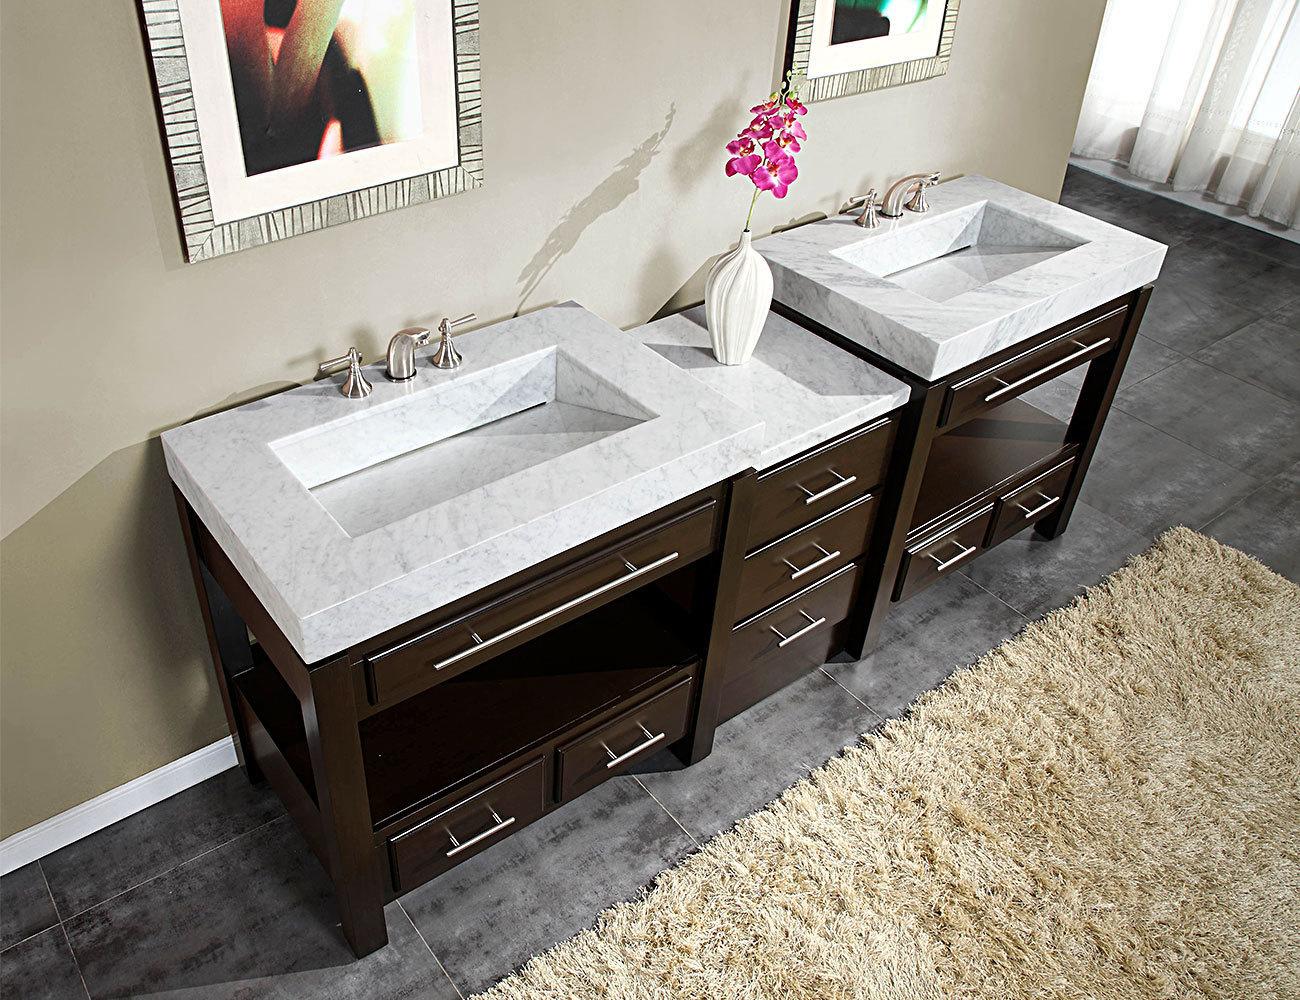 Accord Contemporary 92 inch  Moduler Bathroom Vanity Espresso Finish Marble Top